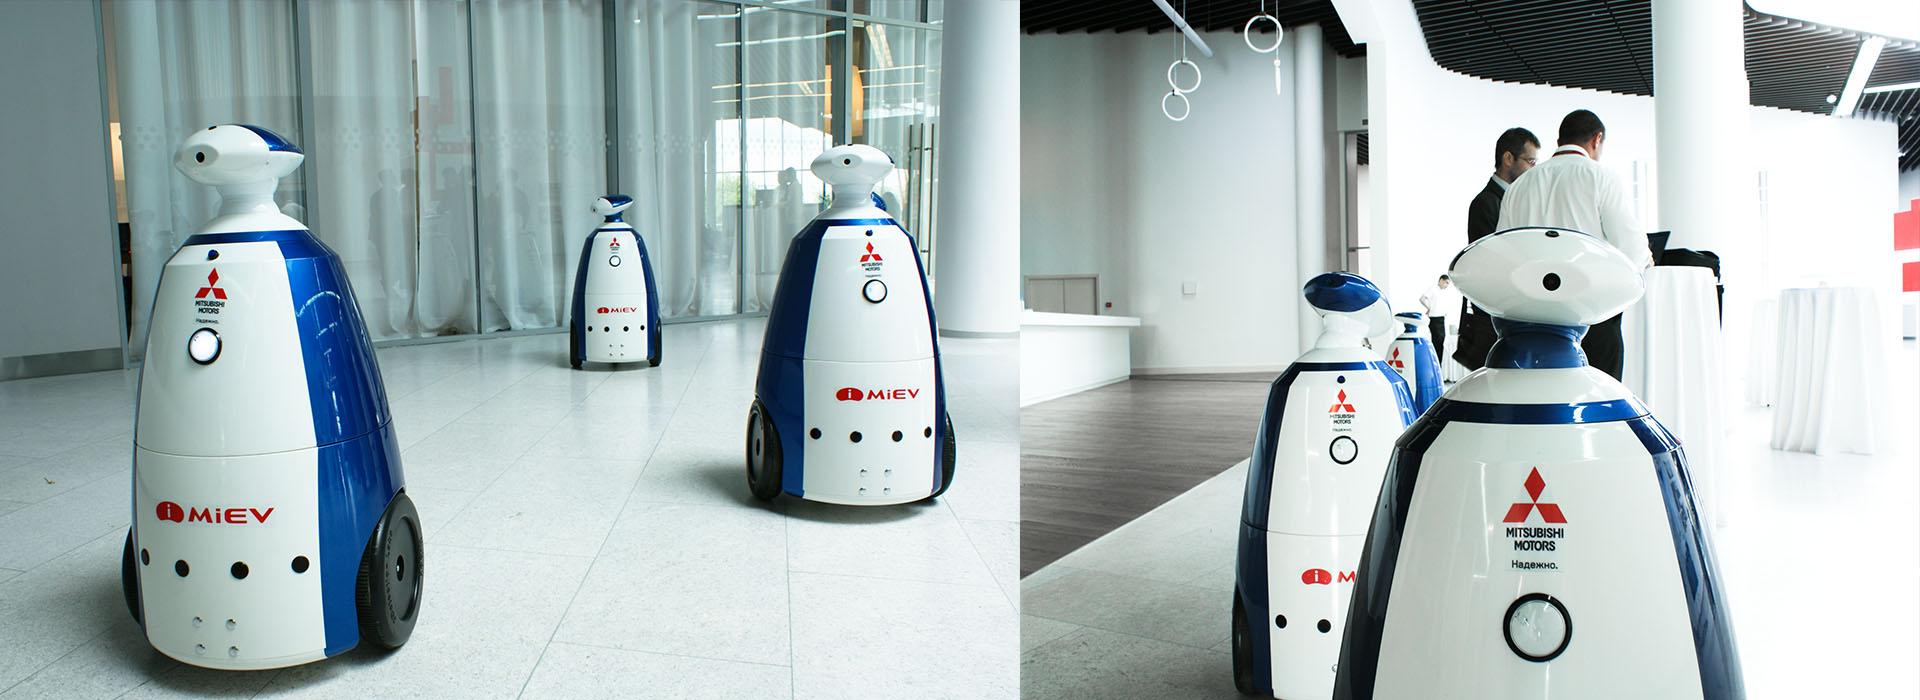 robotics production corporate identity, производитель робототехники logo